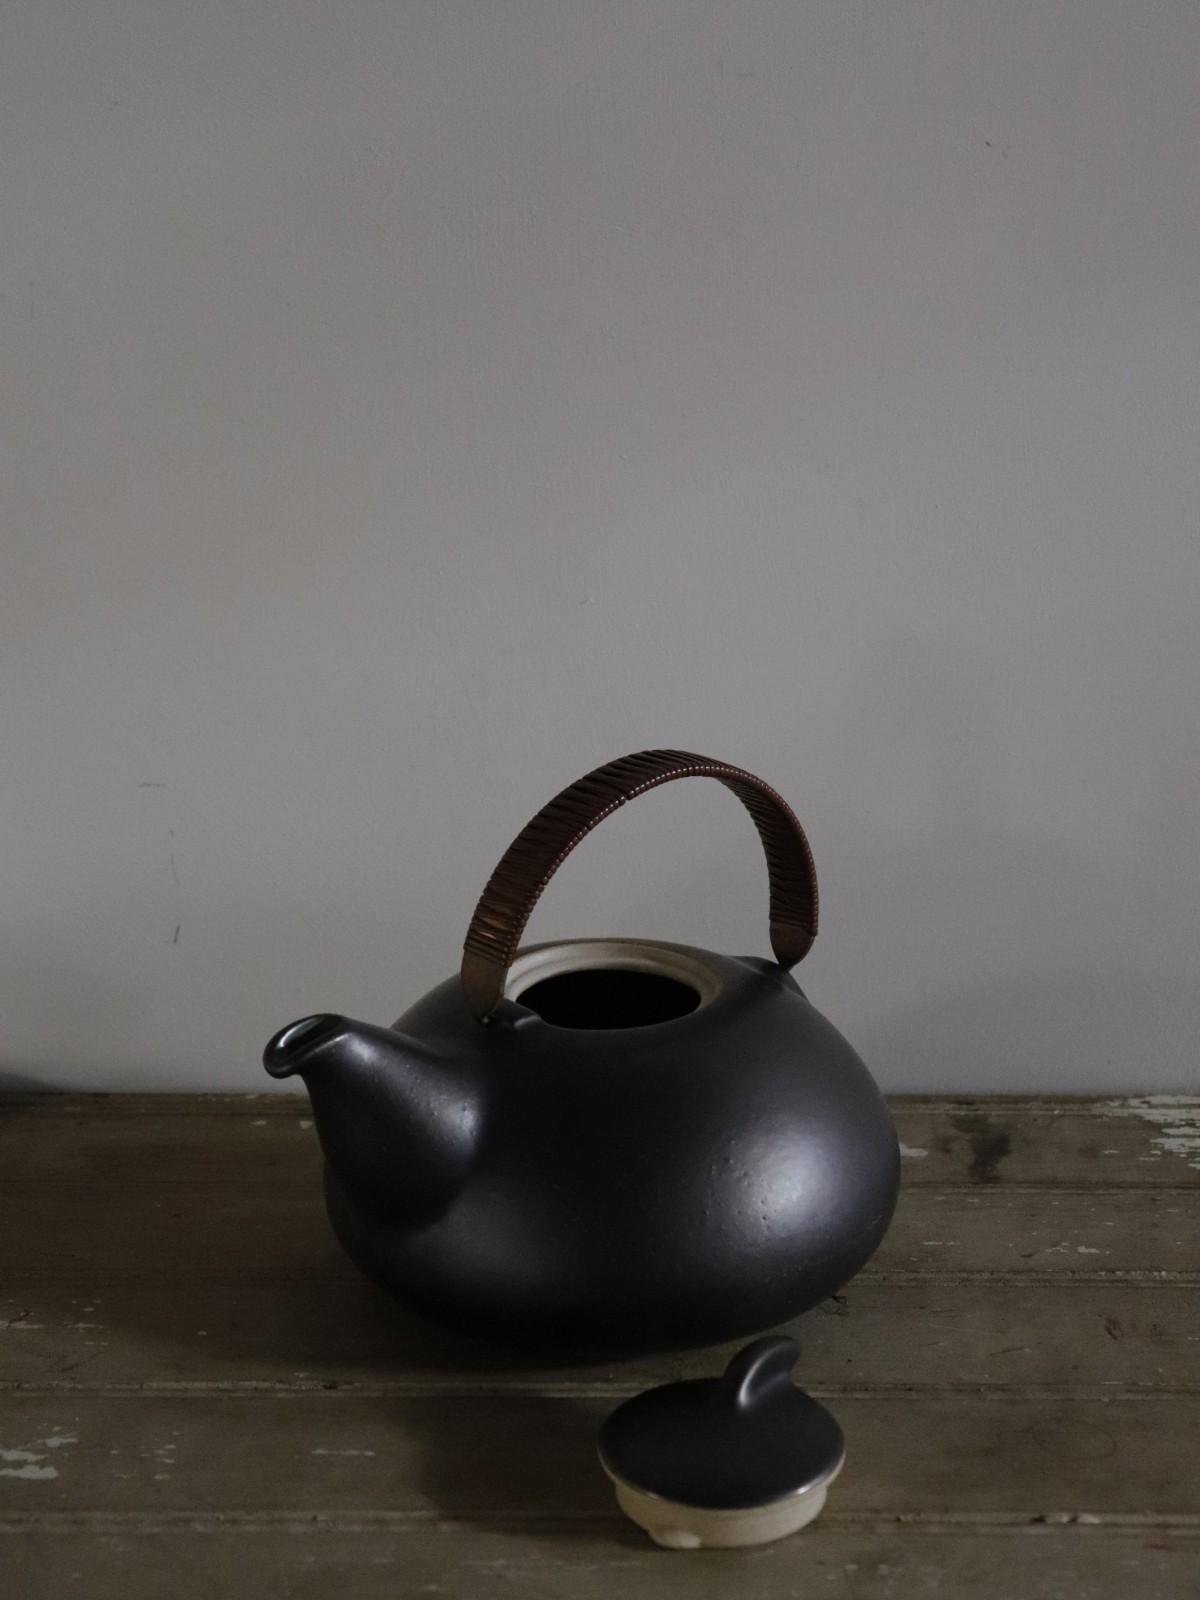 heath ceramics,mcm, tea pot, usa